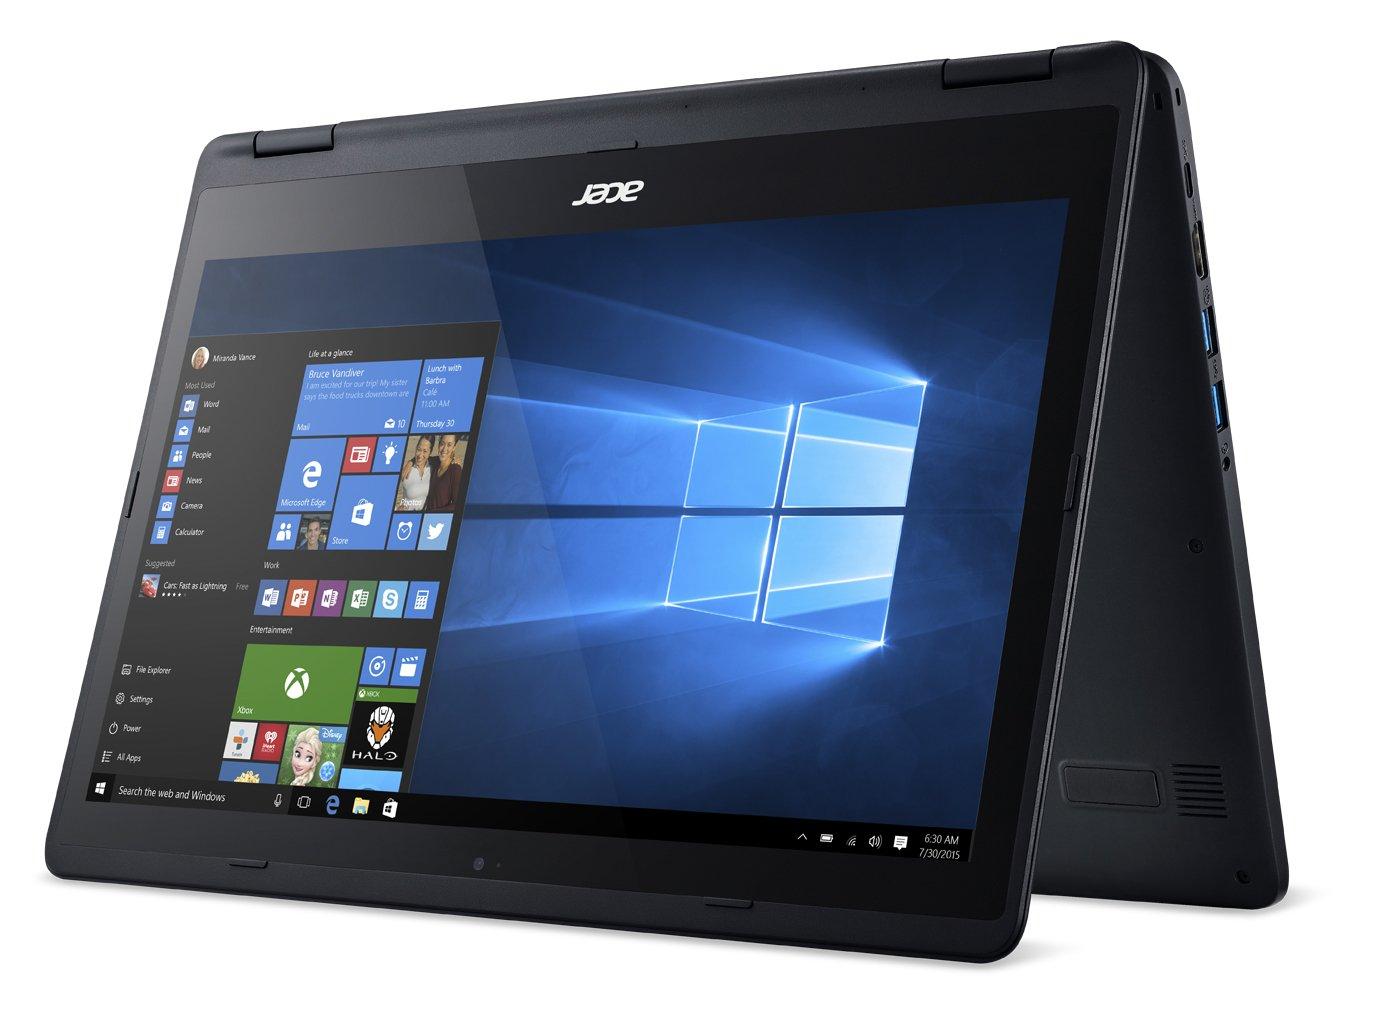 acer aspire 14 touchscreen notebook 8gb ram 256gb ssd intel i5 2 3ghz black ebay. Black Bedroom Furniture Sets. Home Design Ideas